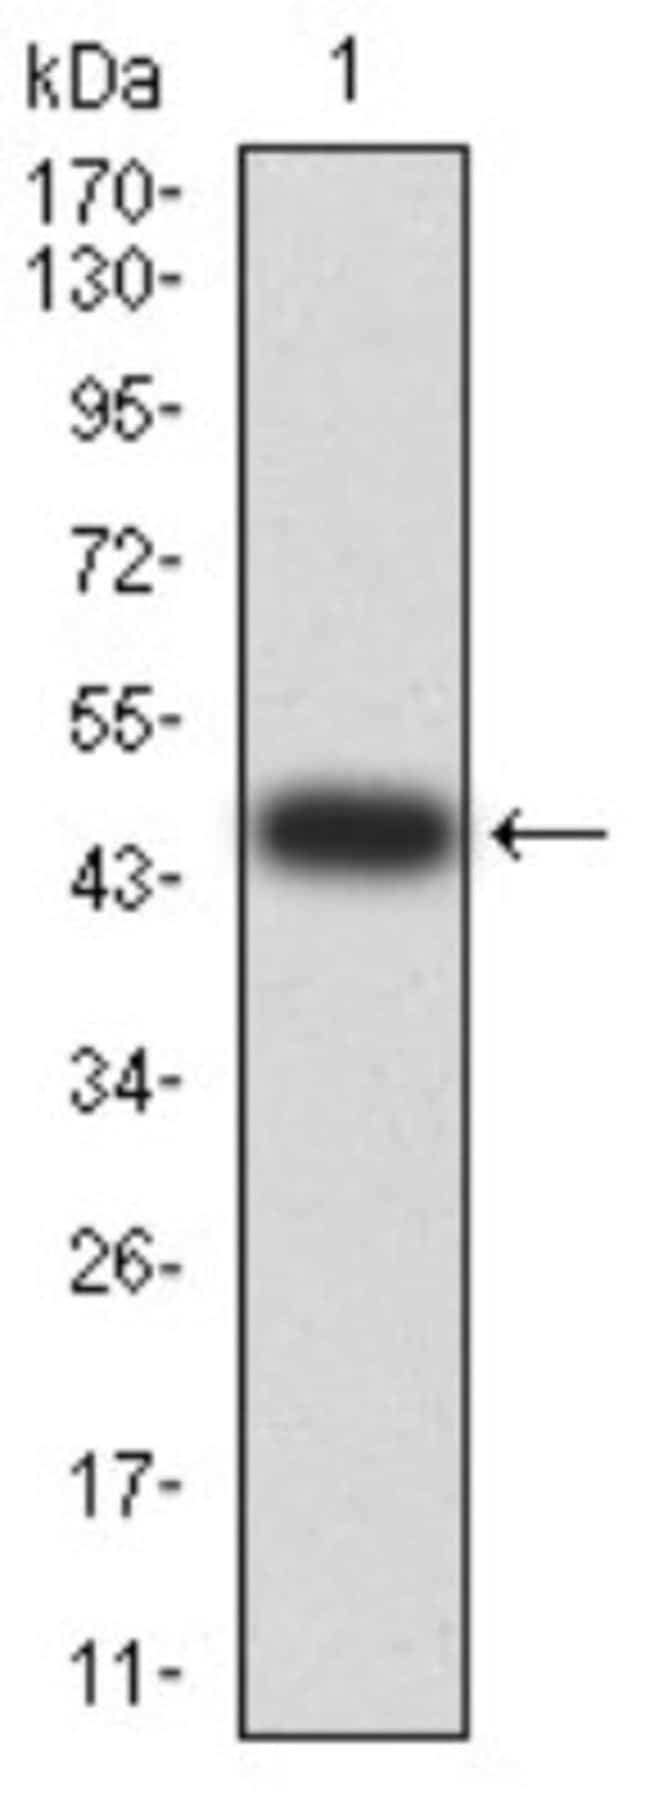 SELS Mouse anti-Human, Clone: 5G4A10, Novus Biologicals 0.1 ml; Unconjugated